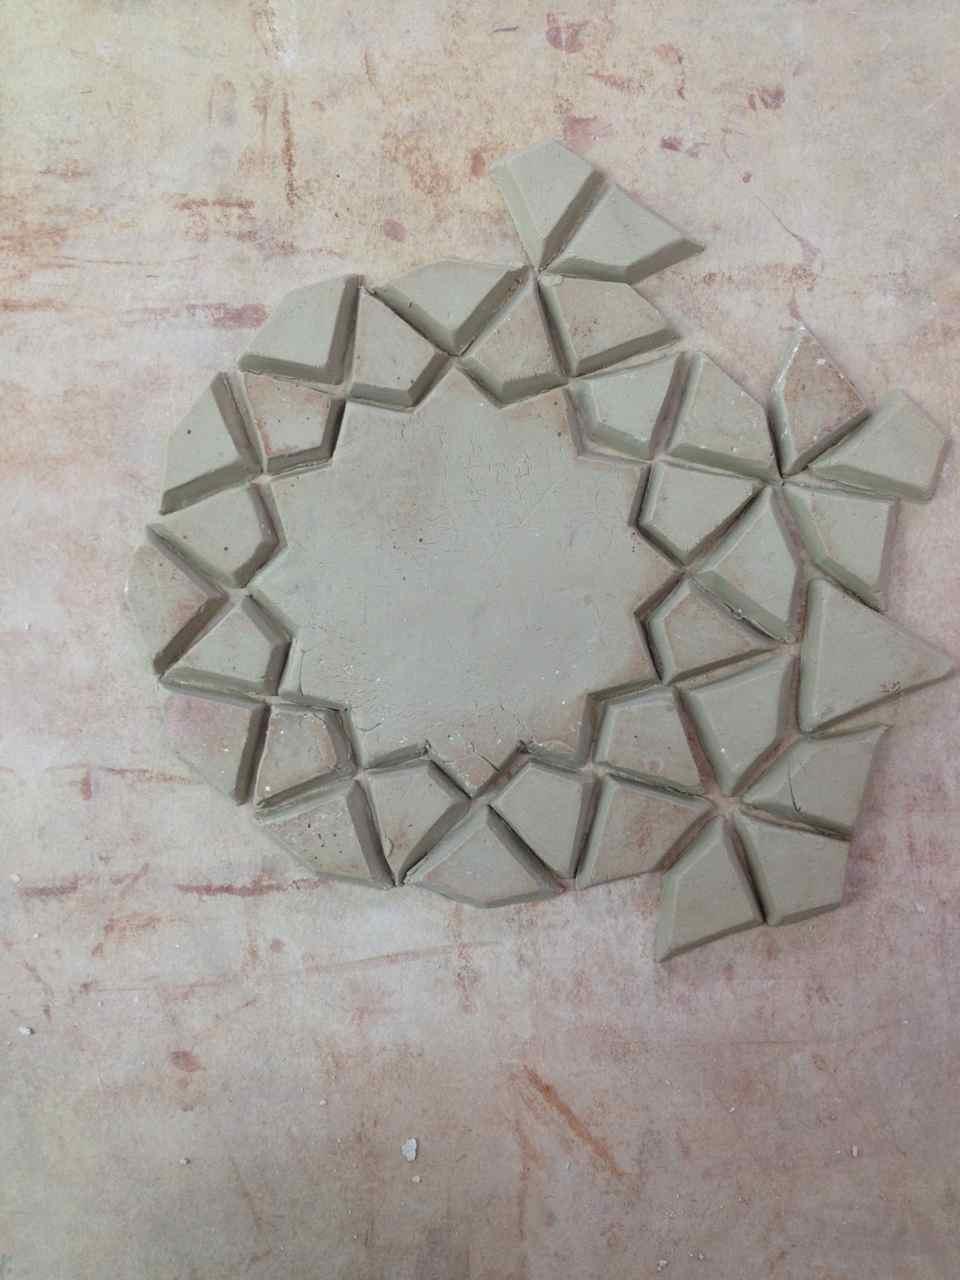 my handmade moulded zillij tile, in progress...